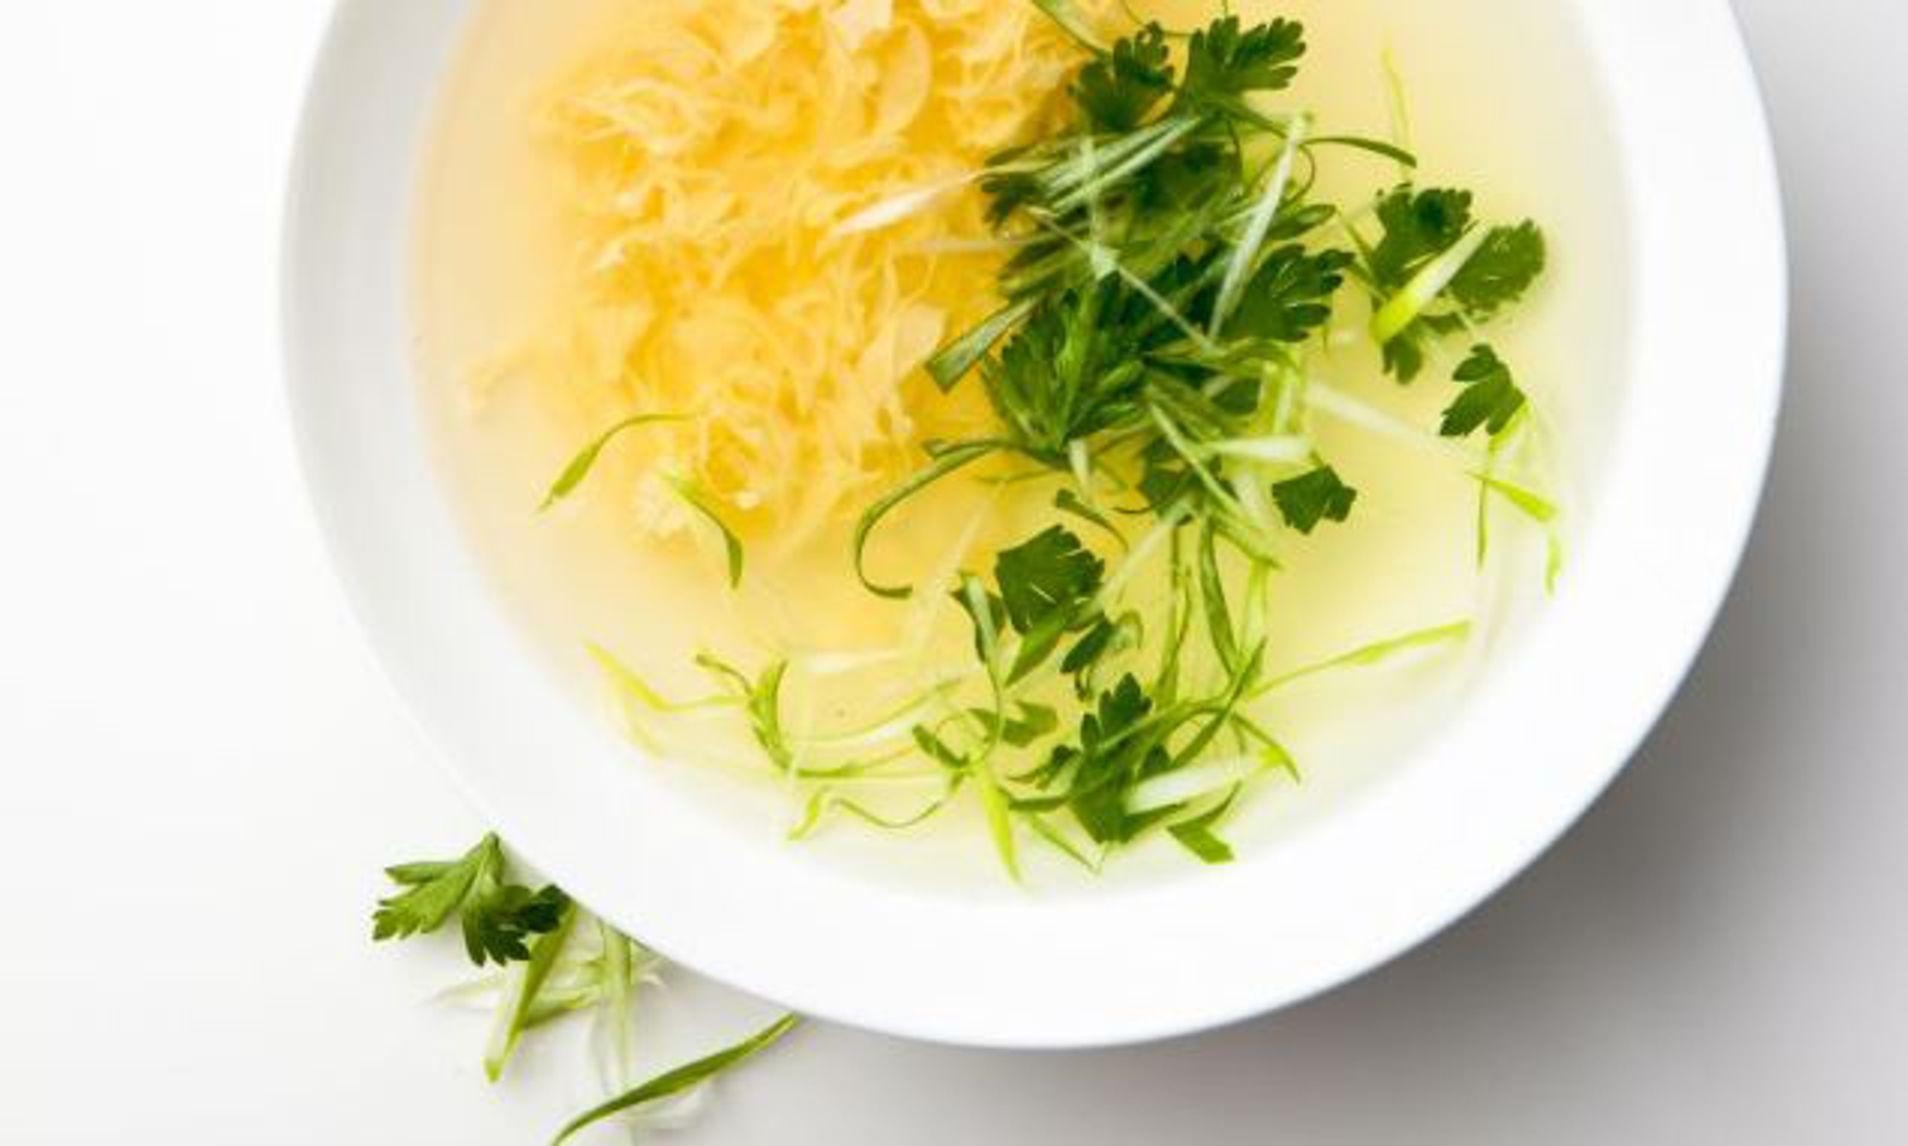 Mimi Spencer S 5 2 Fast Diet Soup Kitchen Fast Food Diet Soup Kitchen 5 2 Fast Diet